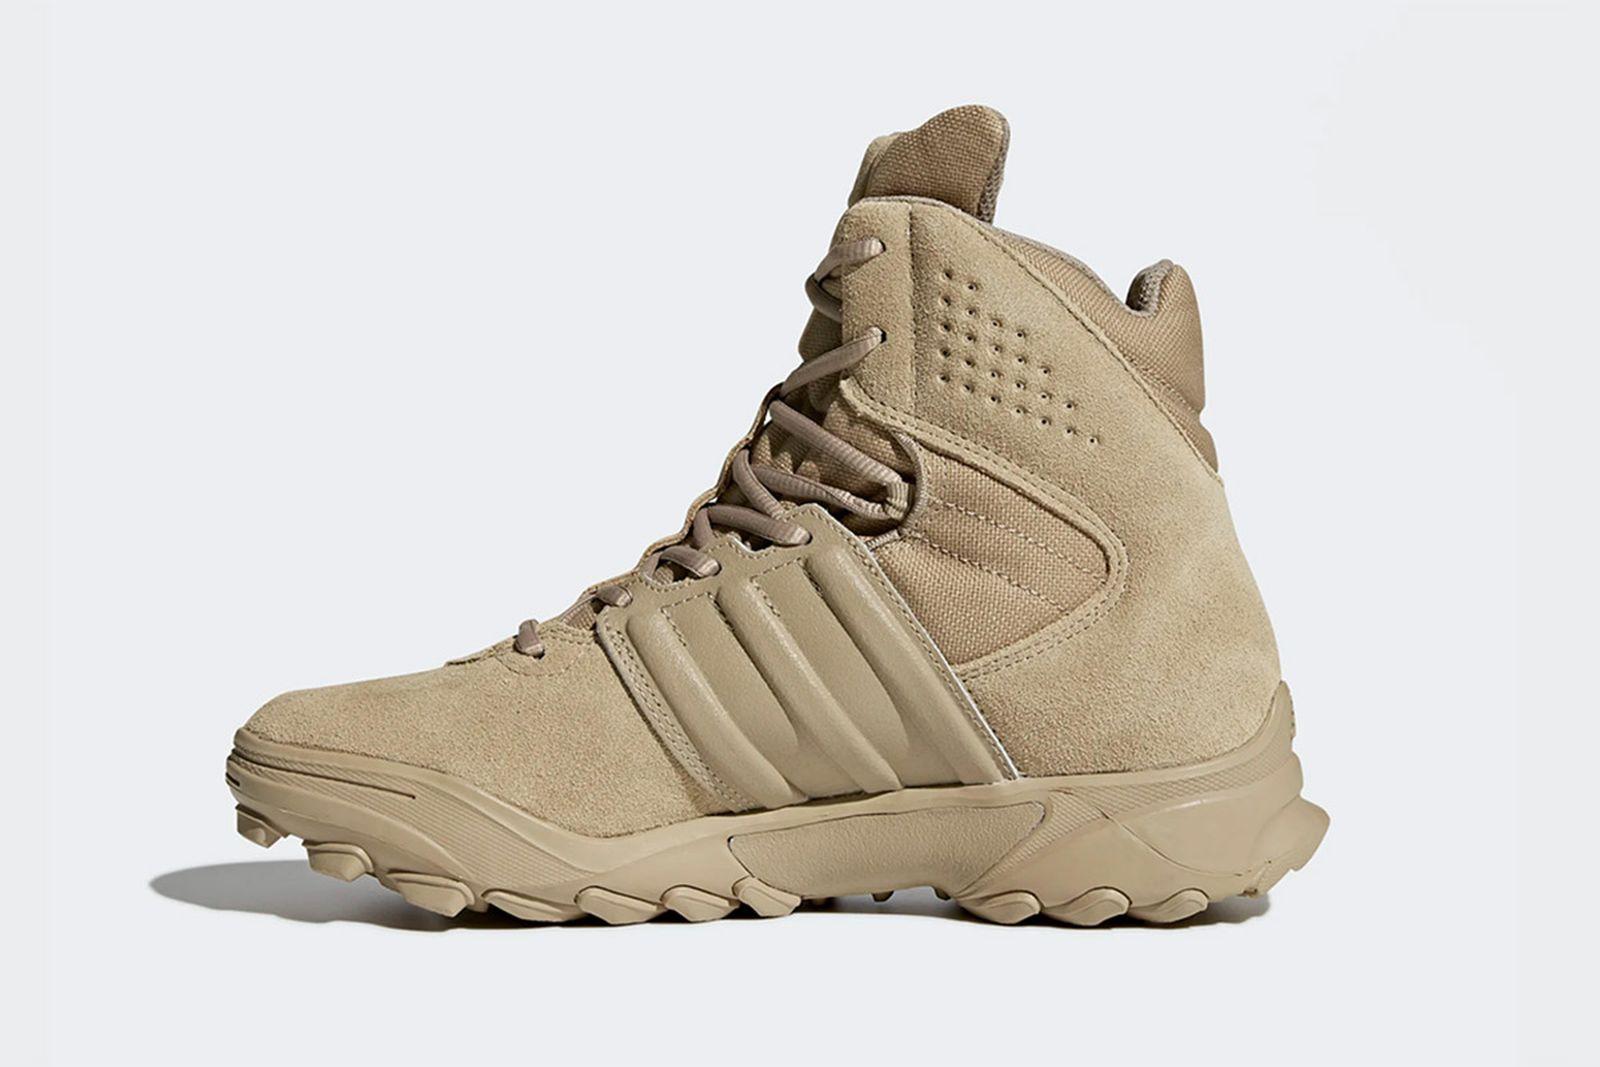 032c Adidas OAMC